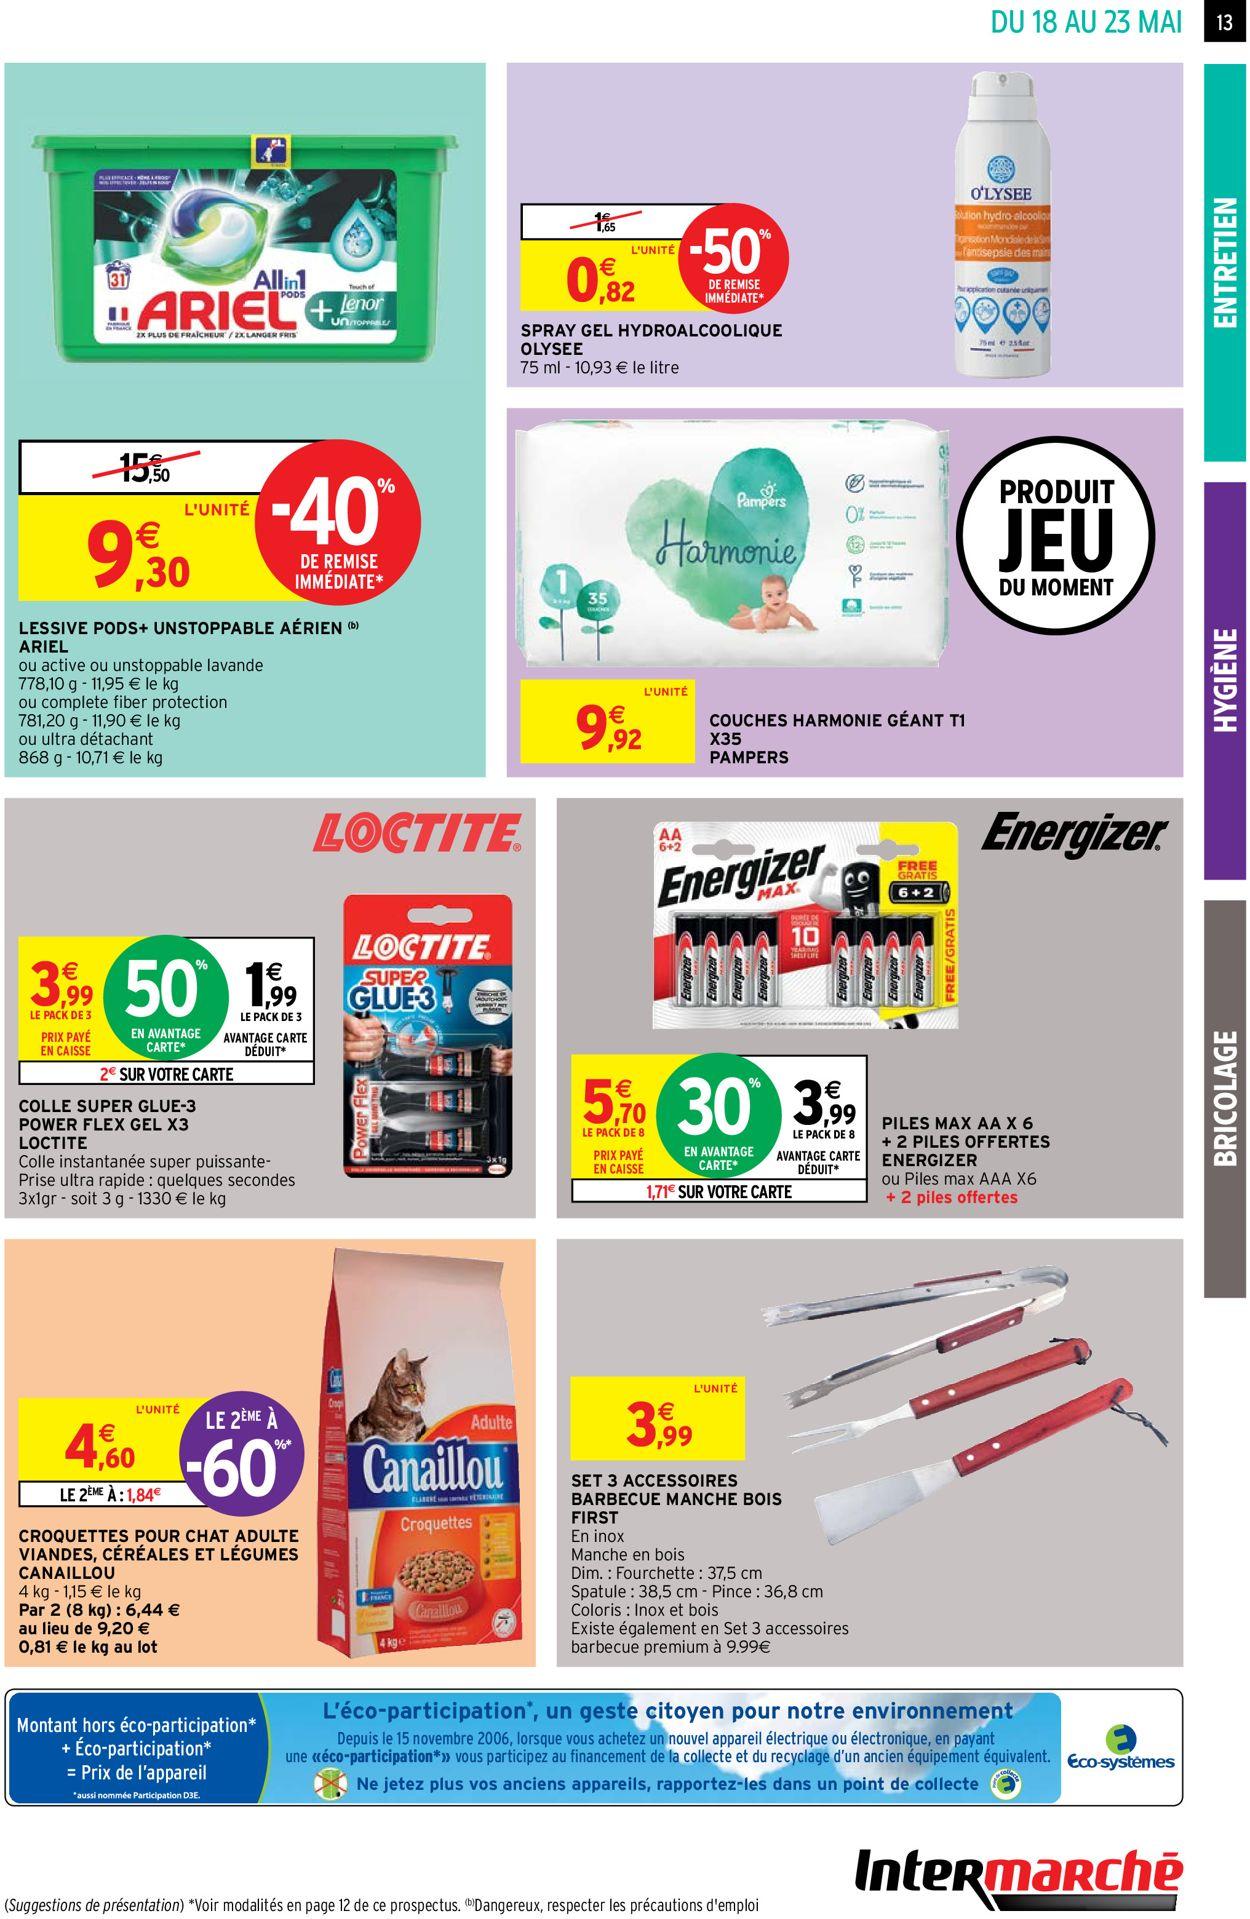 Intermarché Catalogue - 18.05-23.05.2021 (Page 13)